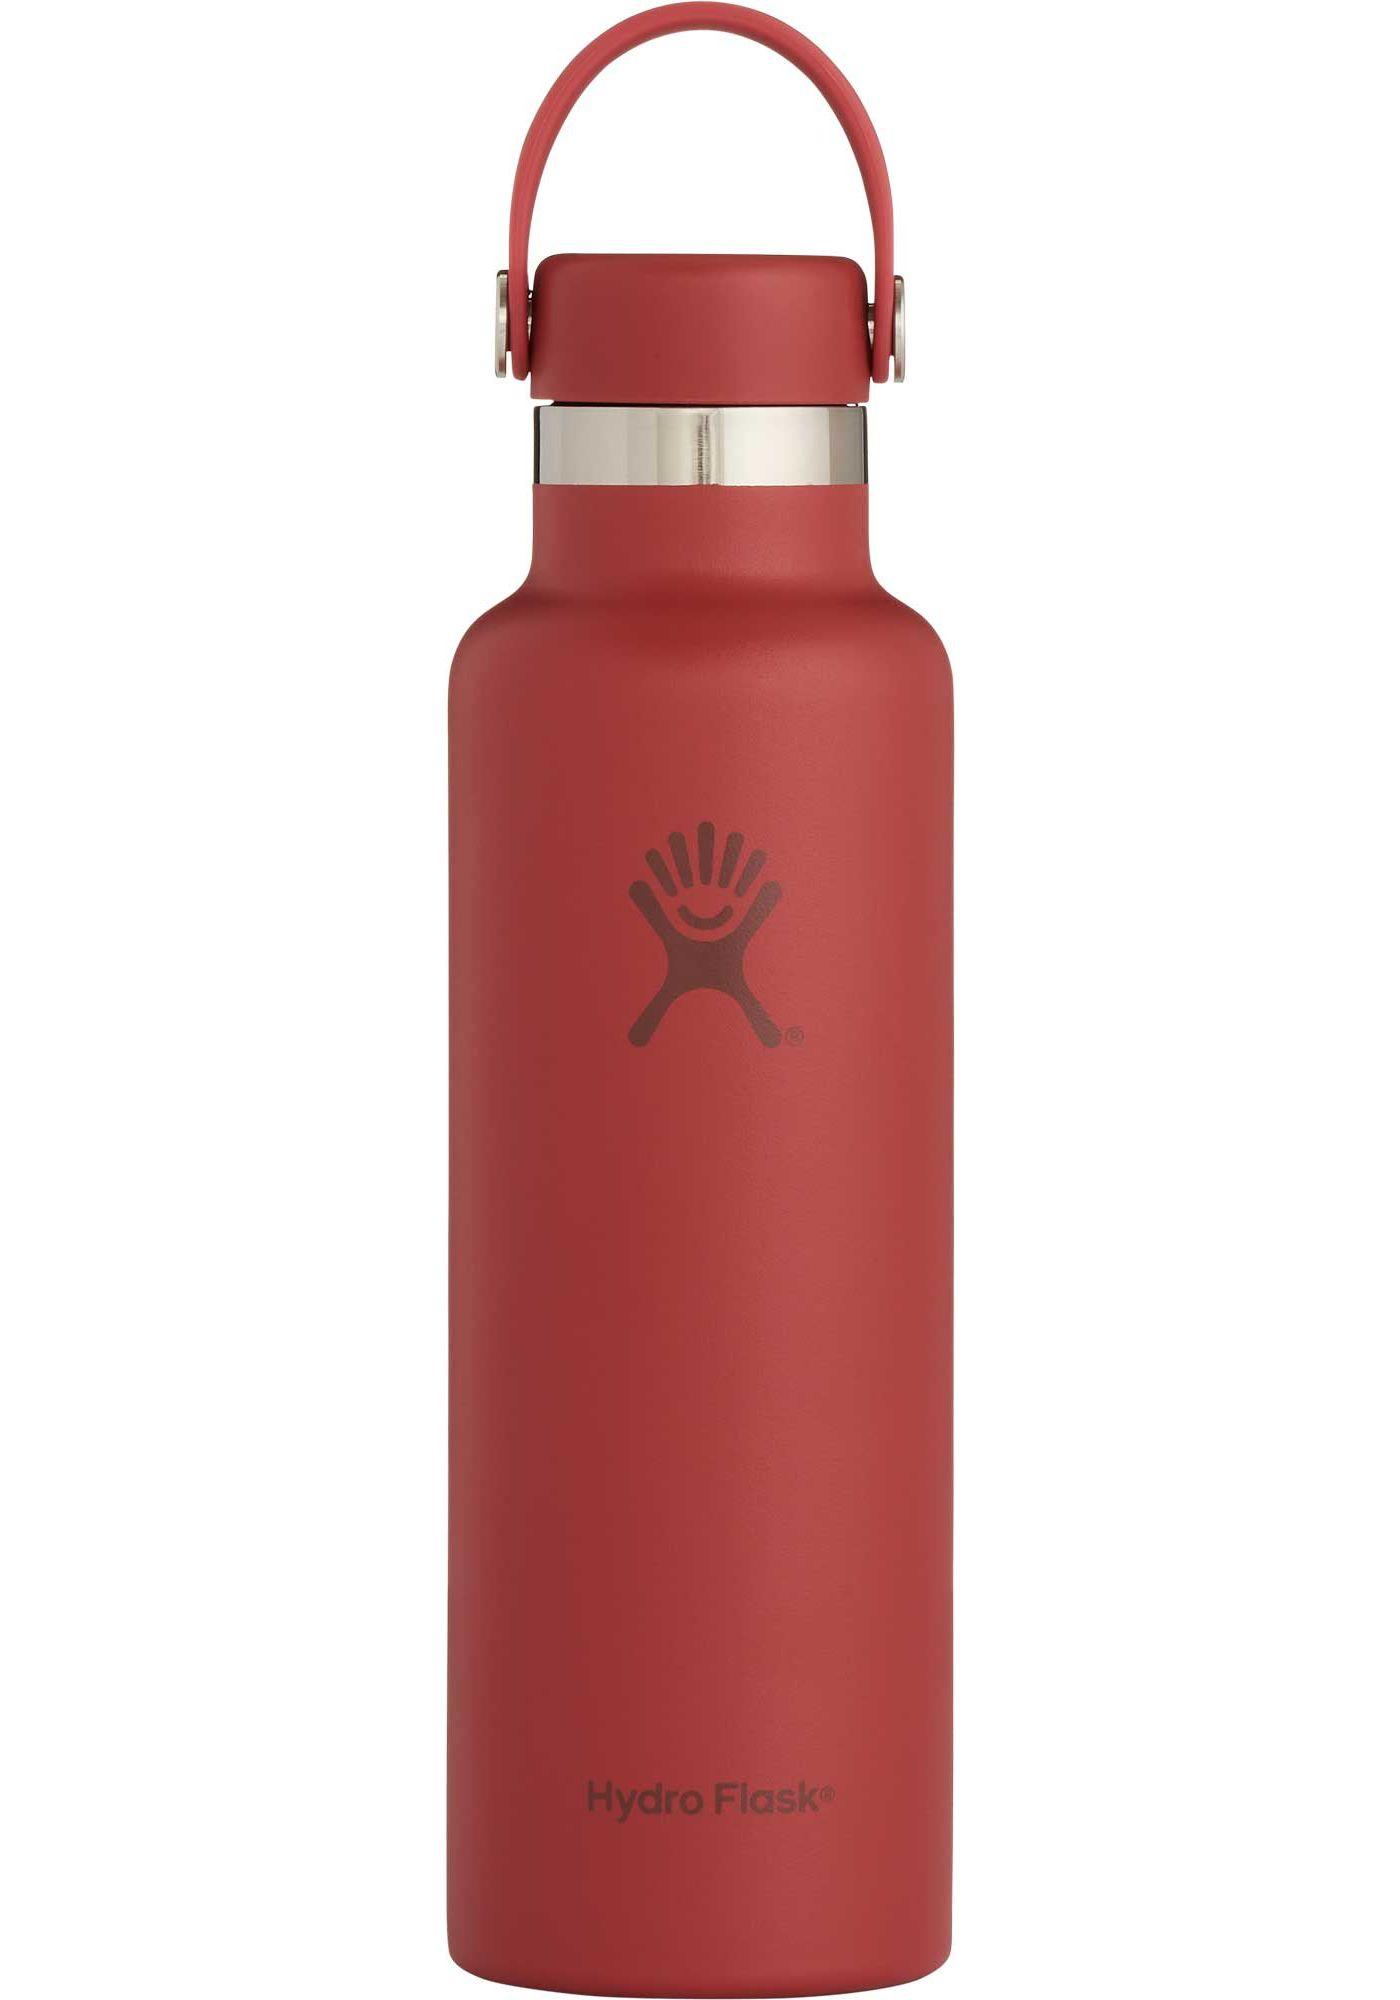 Hydro Flask Skyline Series 21 oz. Standard Mouth Bottle